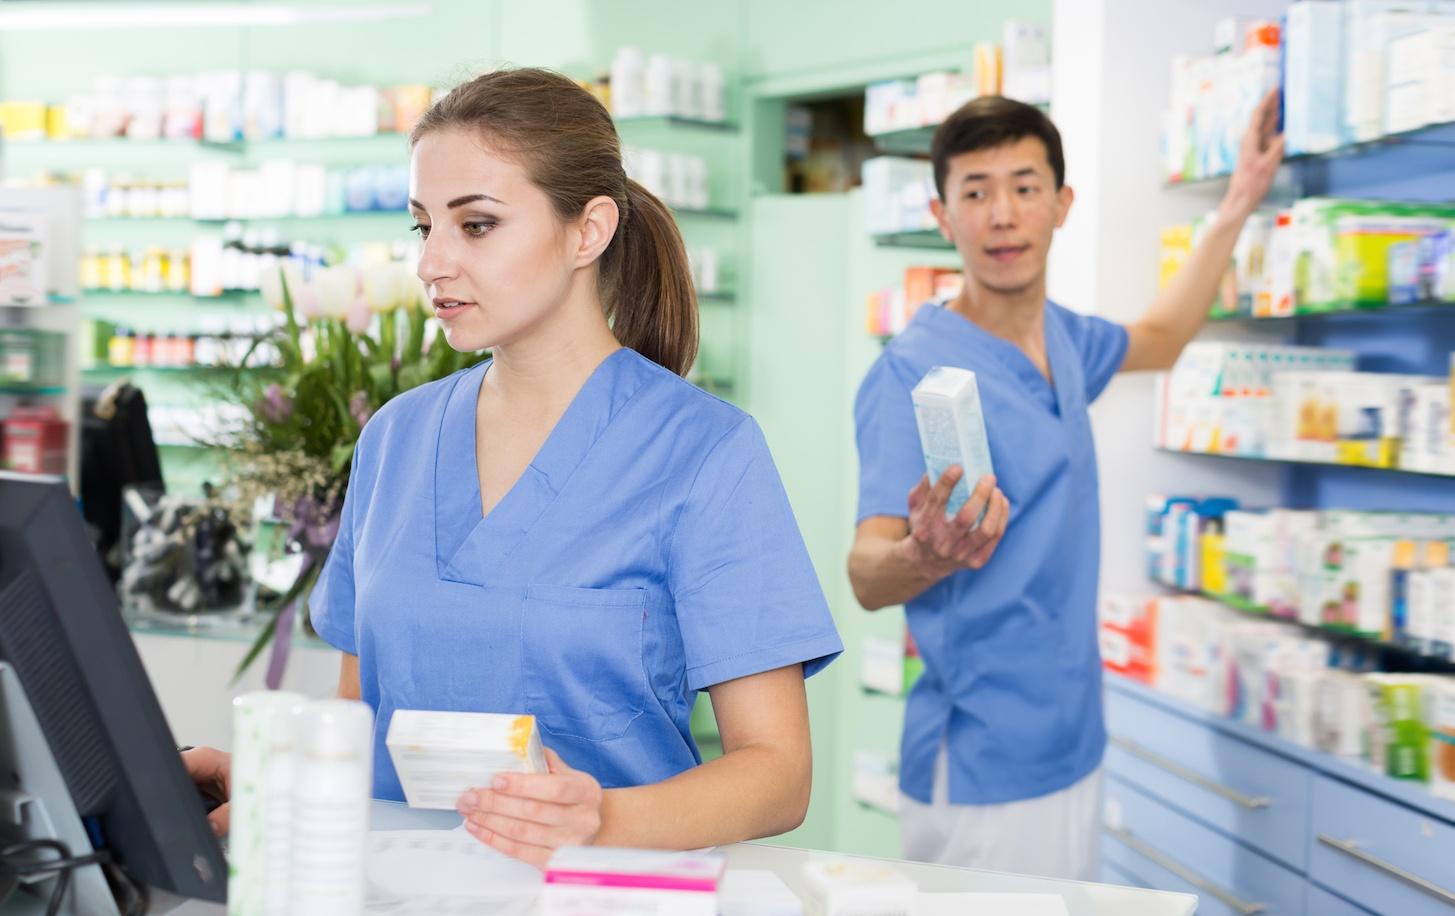 pharm tech technician at pharmacy